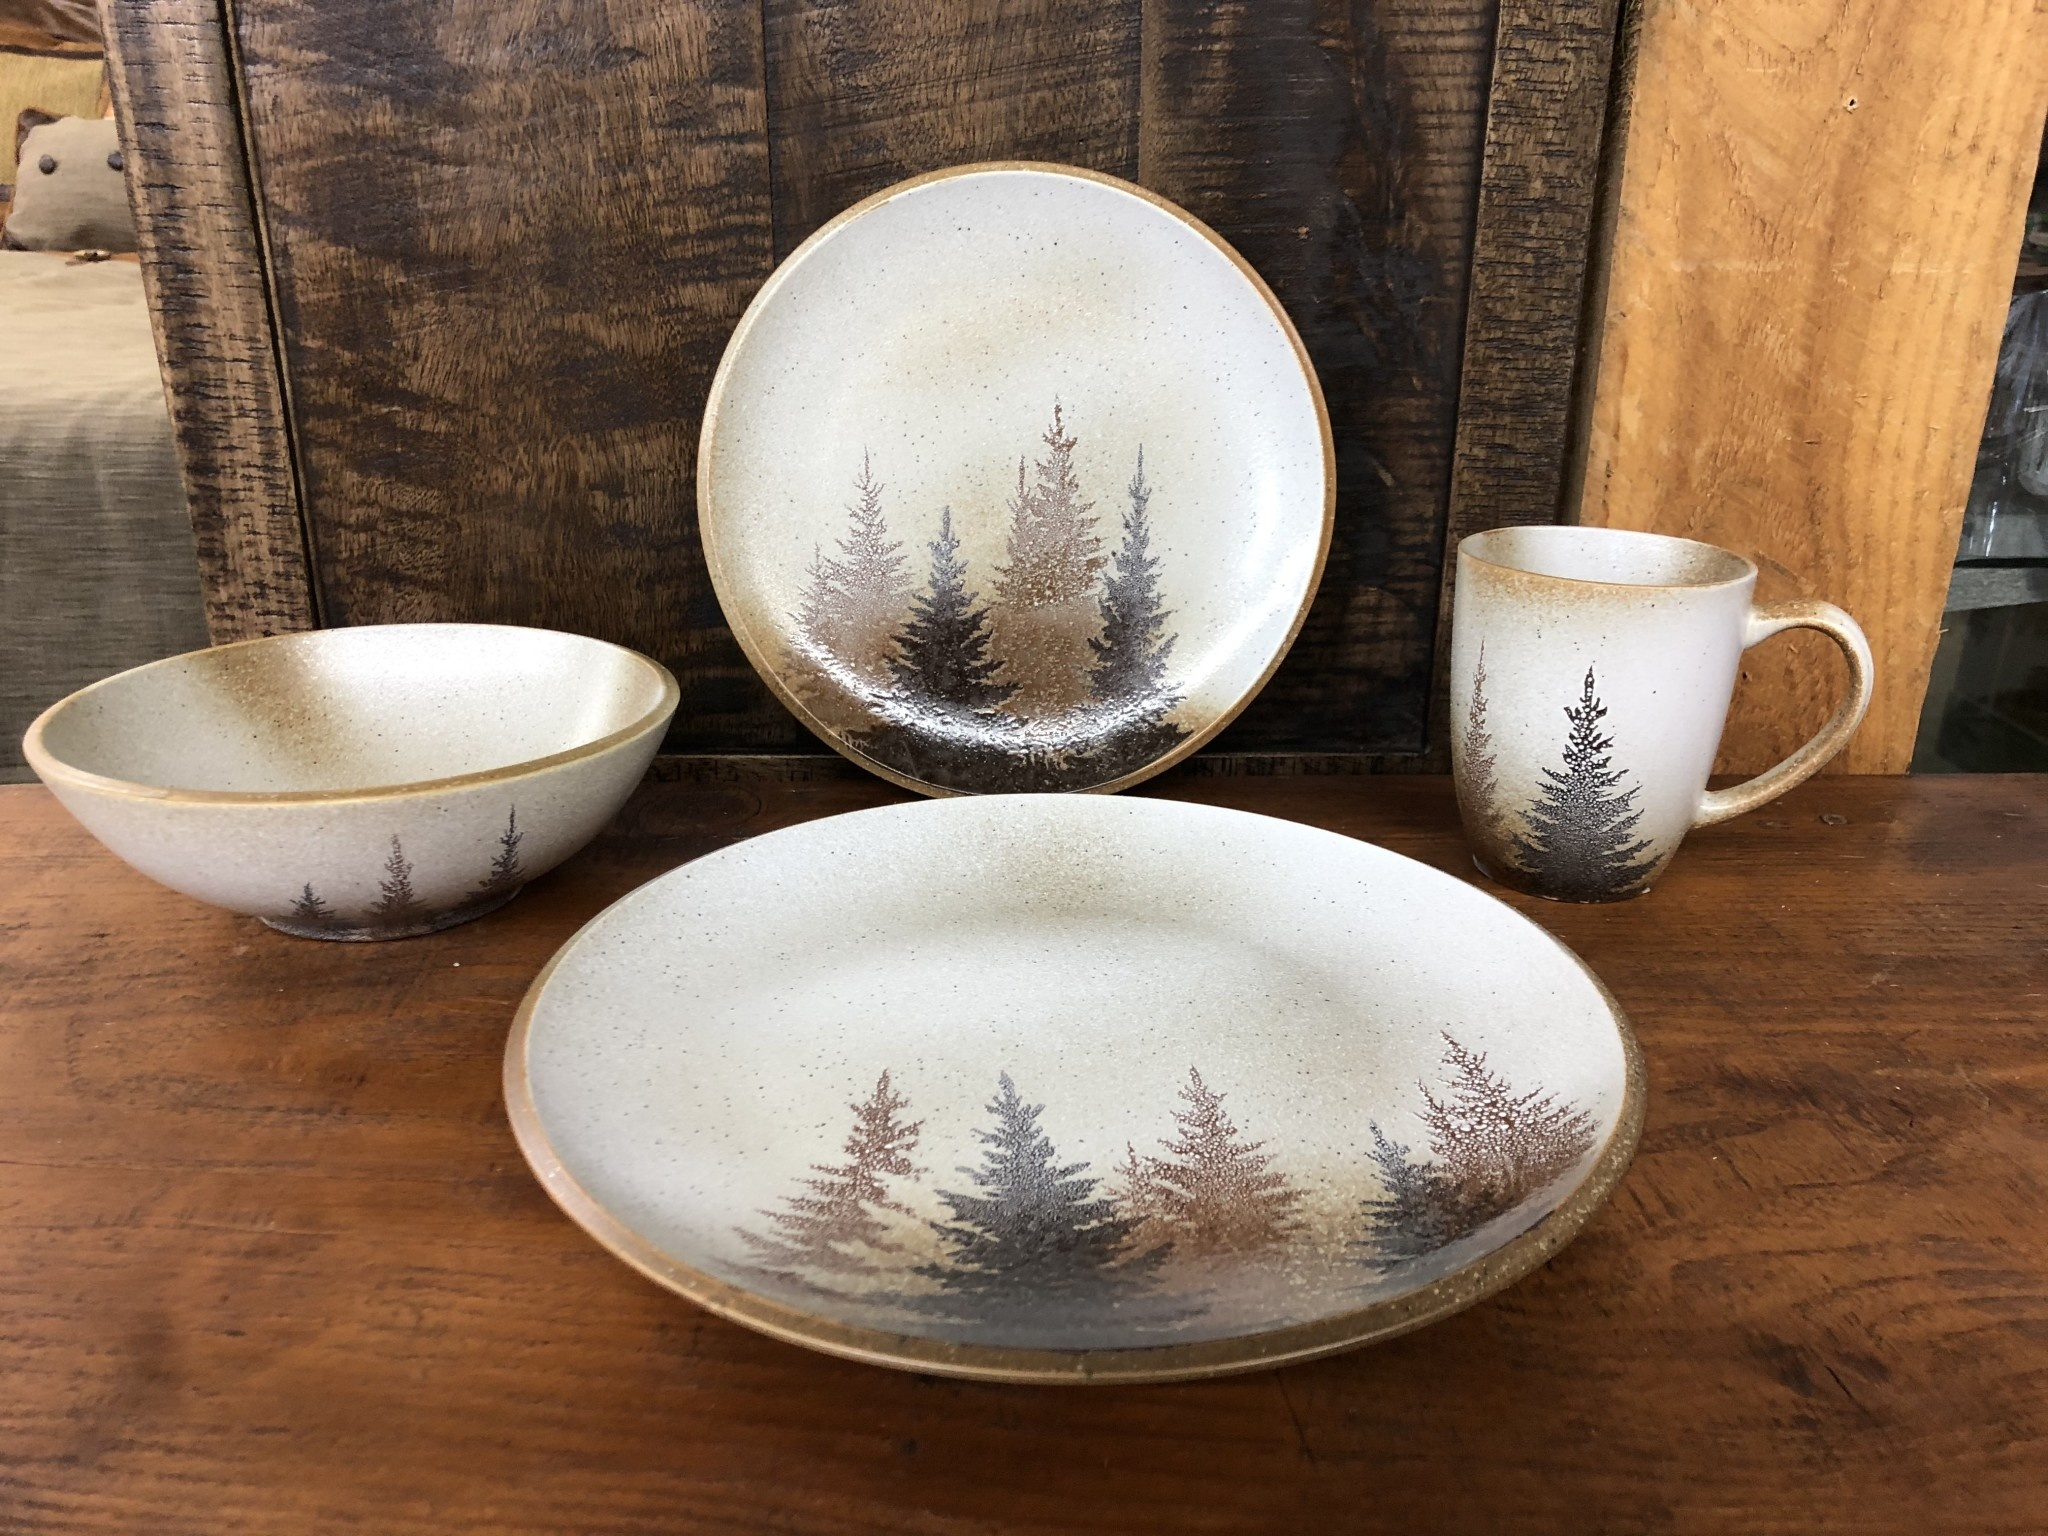 Hiend Clearwater Pines Stoneware Dinner Plate